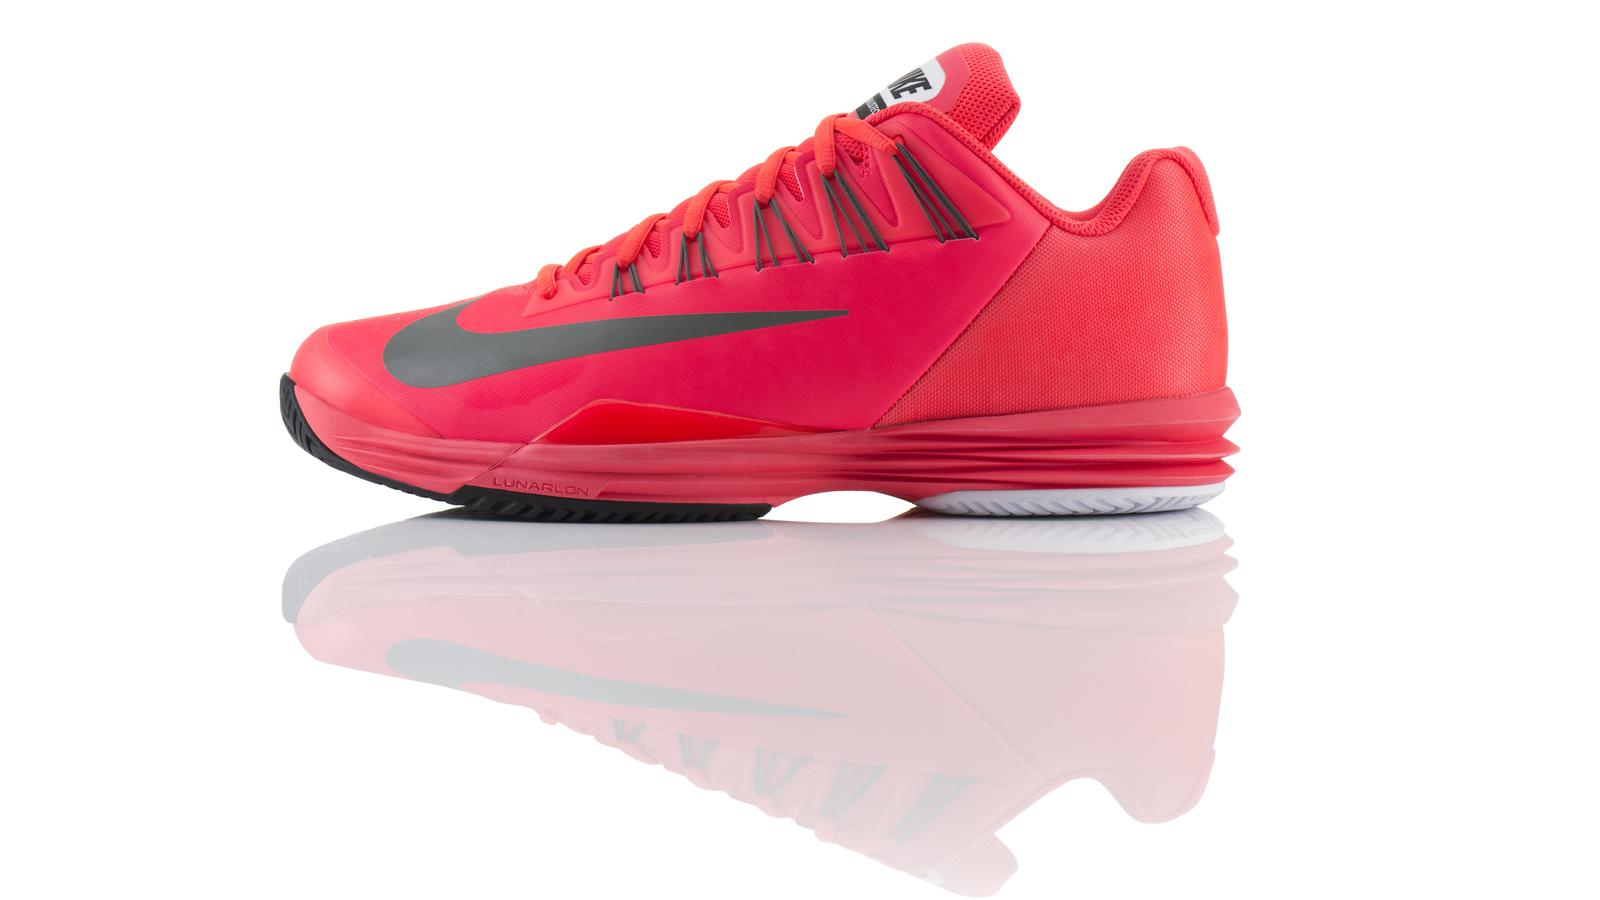 creativo intermitente reflujo  Nike Tennis Unveils the All-New Lightweight Nike Lunar Ballistec - Nike News